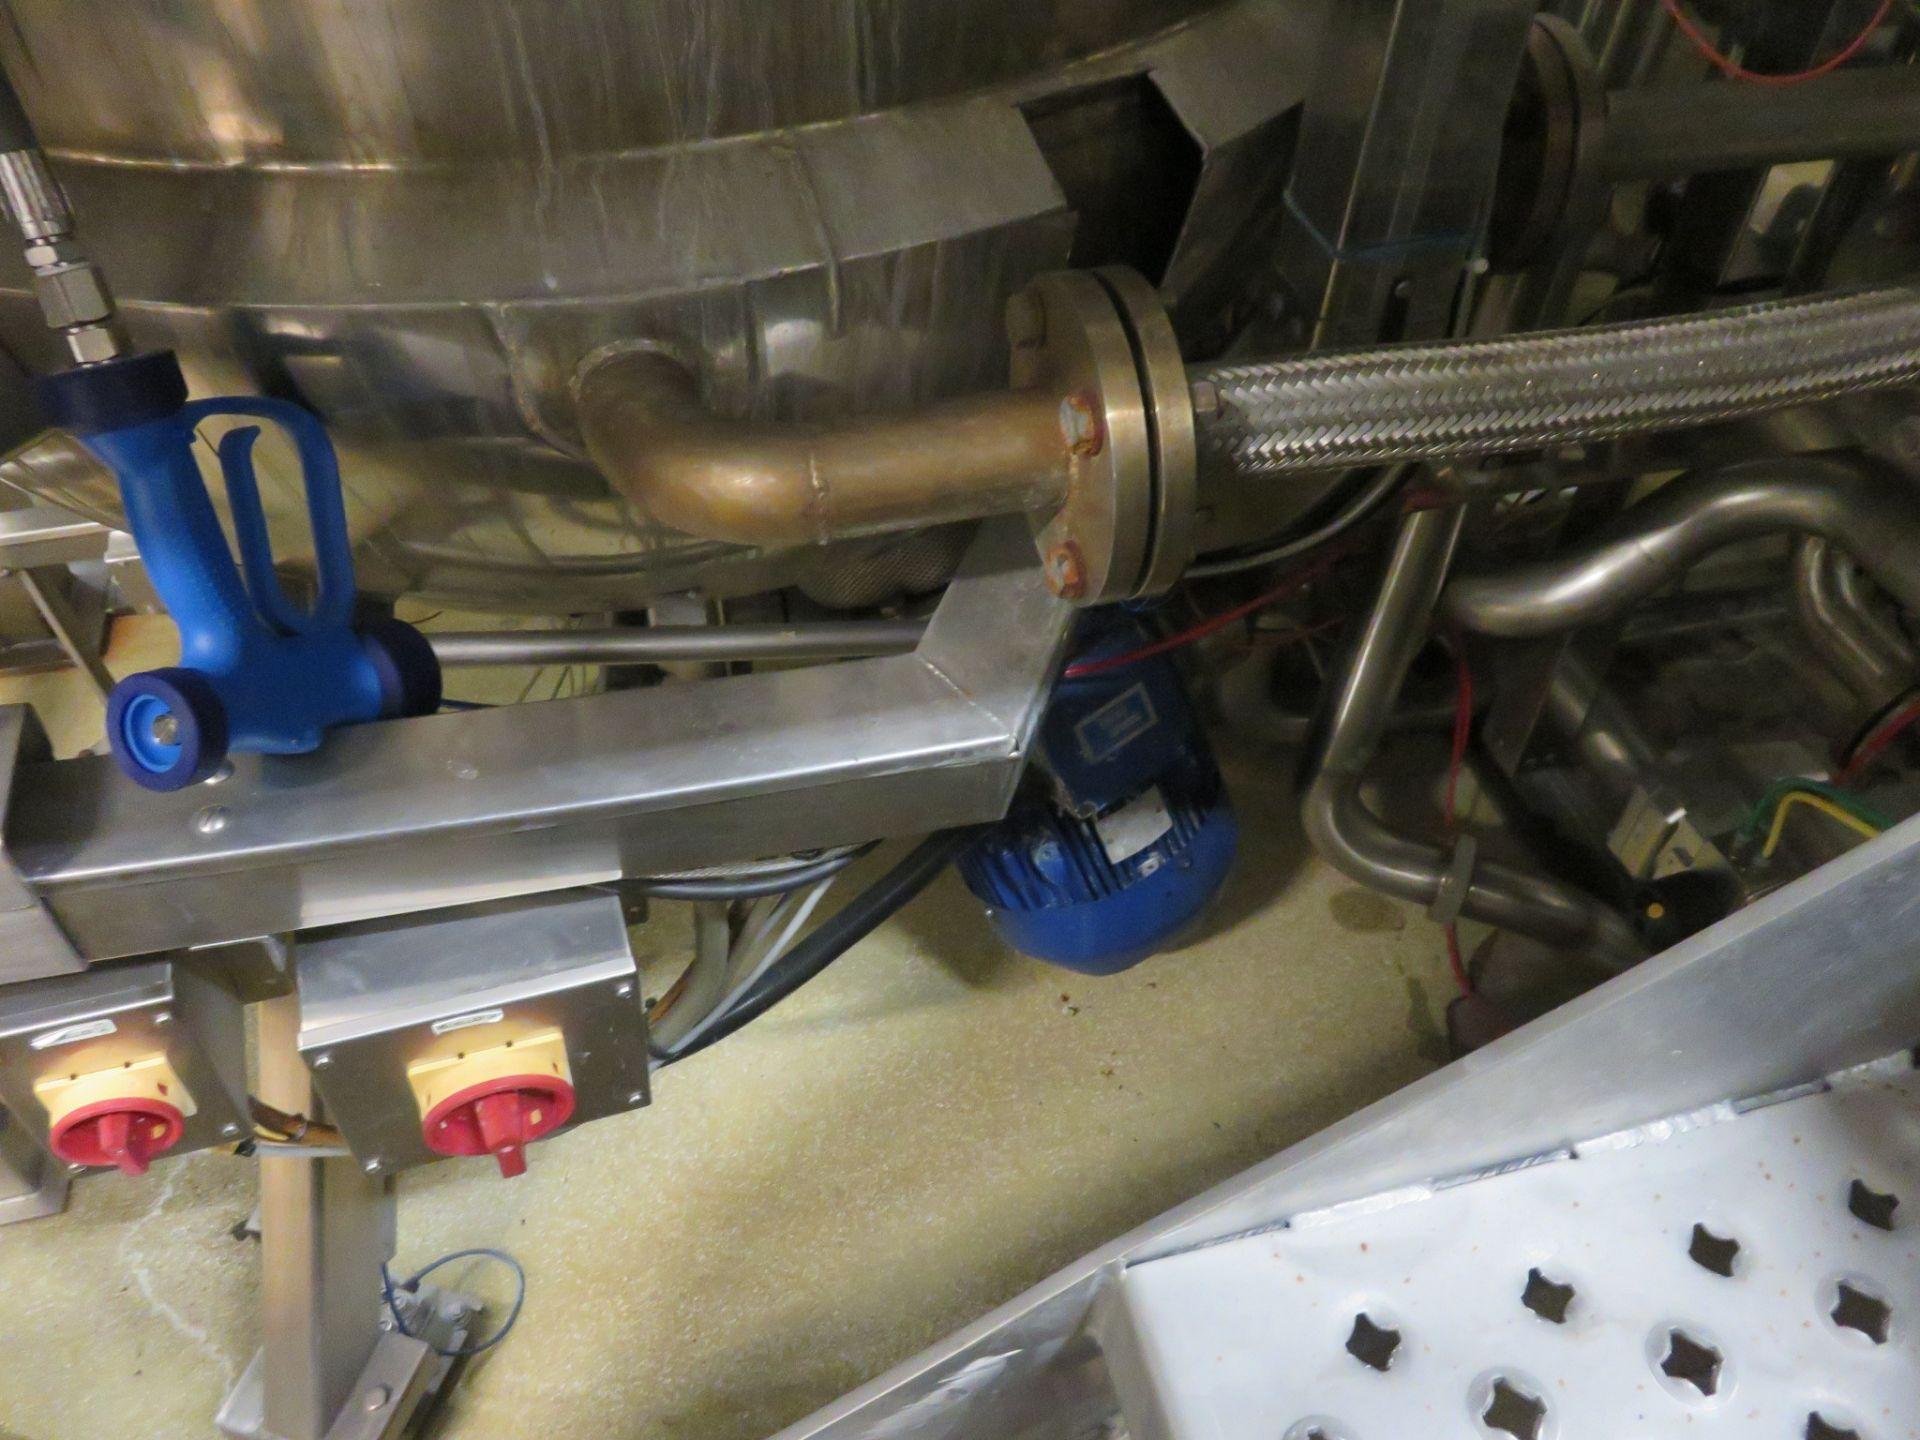 Lot 60 - Complete Soup Plant by Guisti: 3 x Tanks 1200 litre; 1 x Tank 1500 litre (horizonta. Lift out £1,920